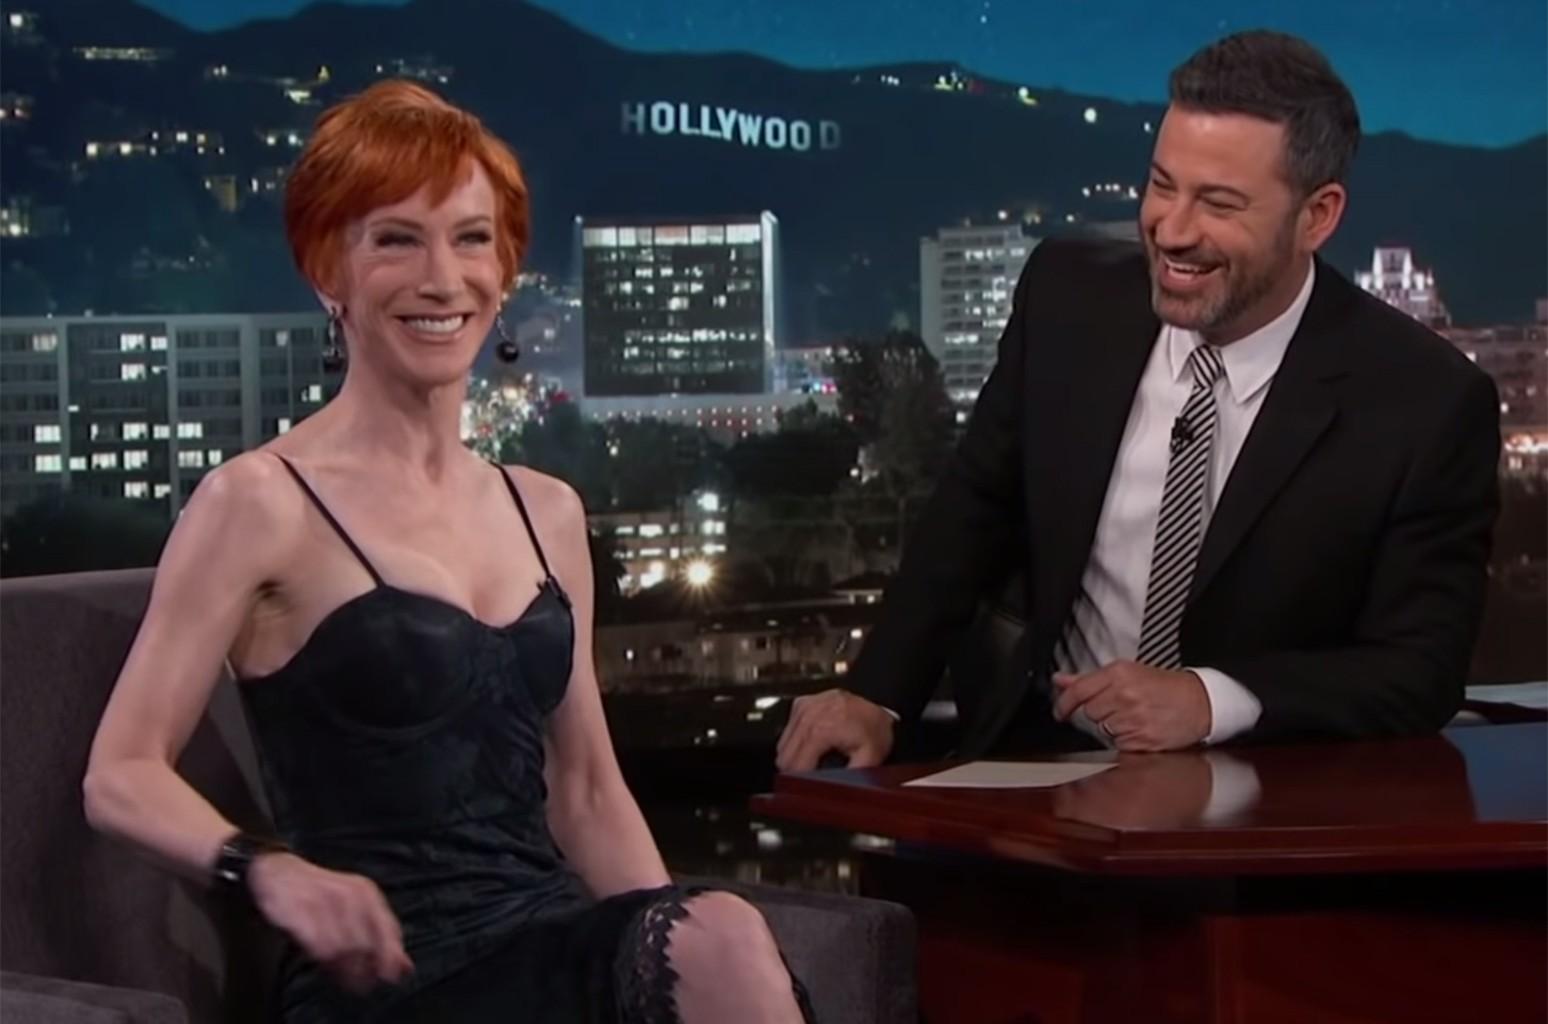 Kathy Griffin on Jimmy Kimmel Live!